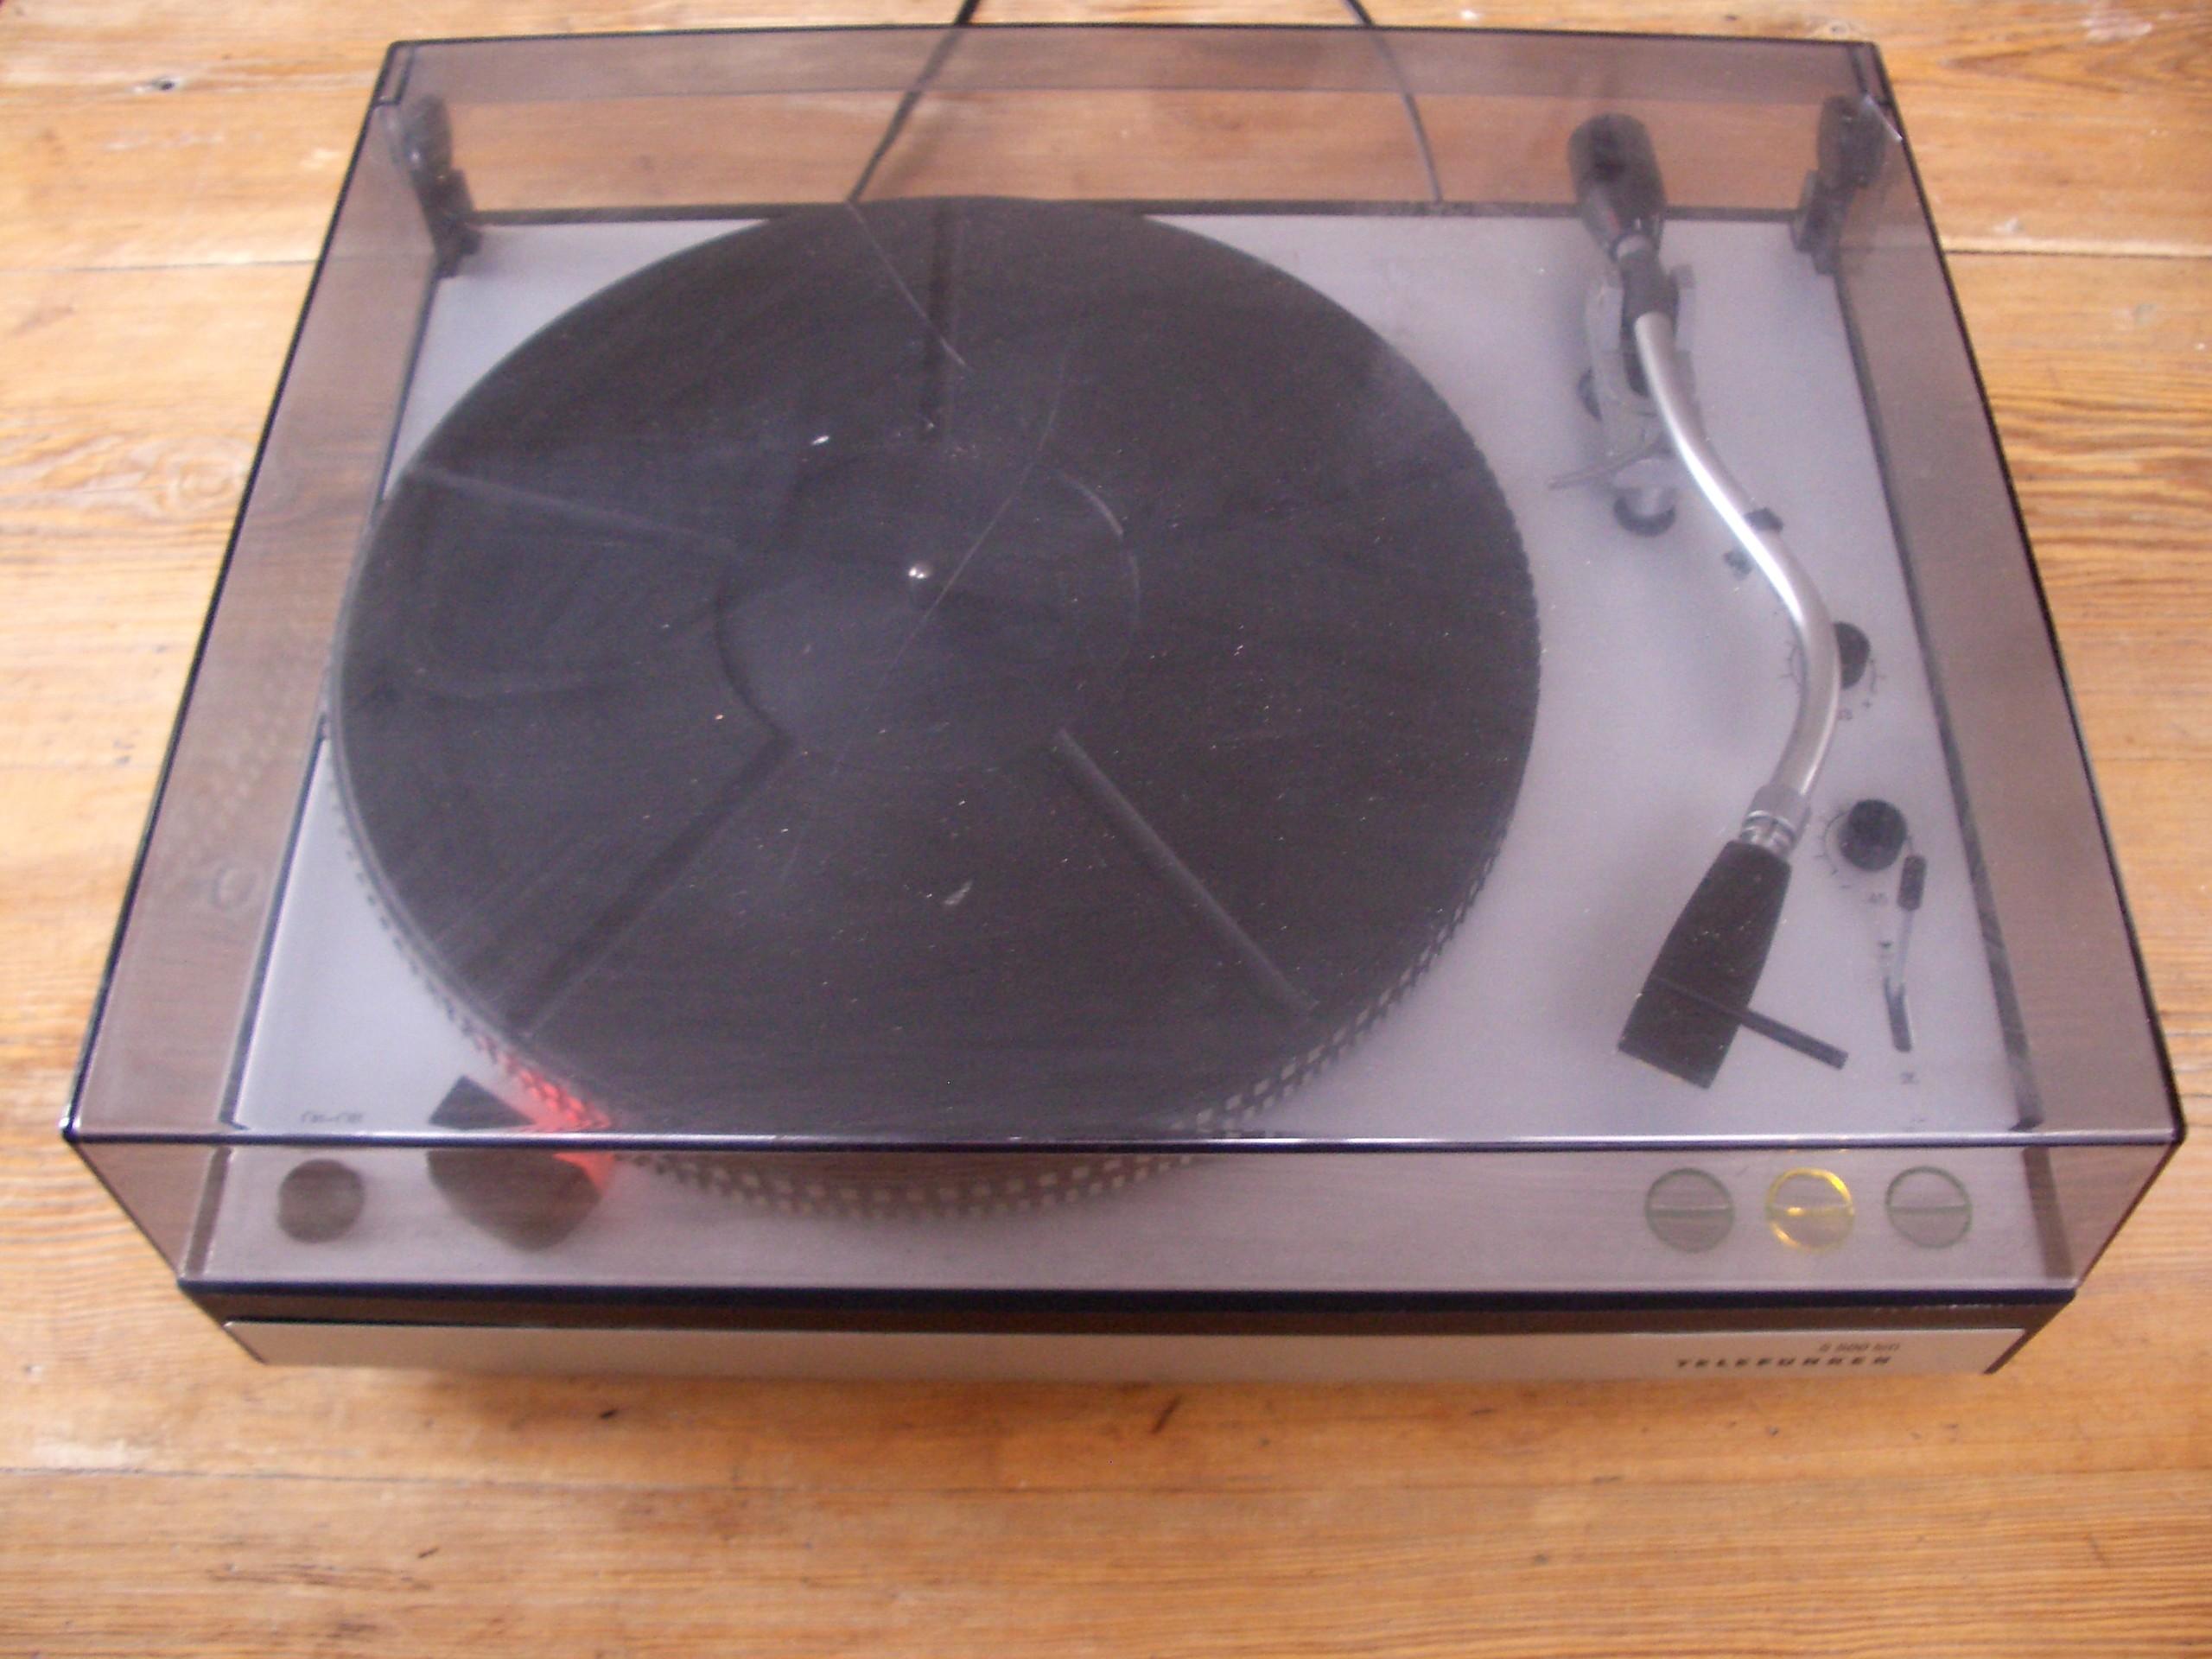 Platine vinyles telefunken s 500 hifi rare turntable vintage ebay - Platines vinyles vintage ...